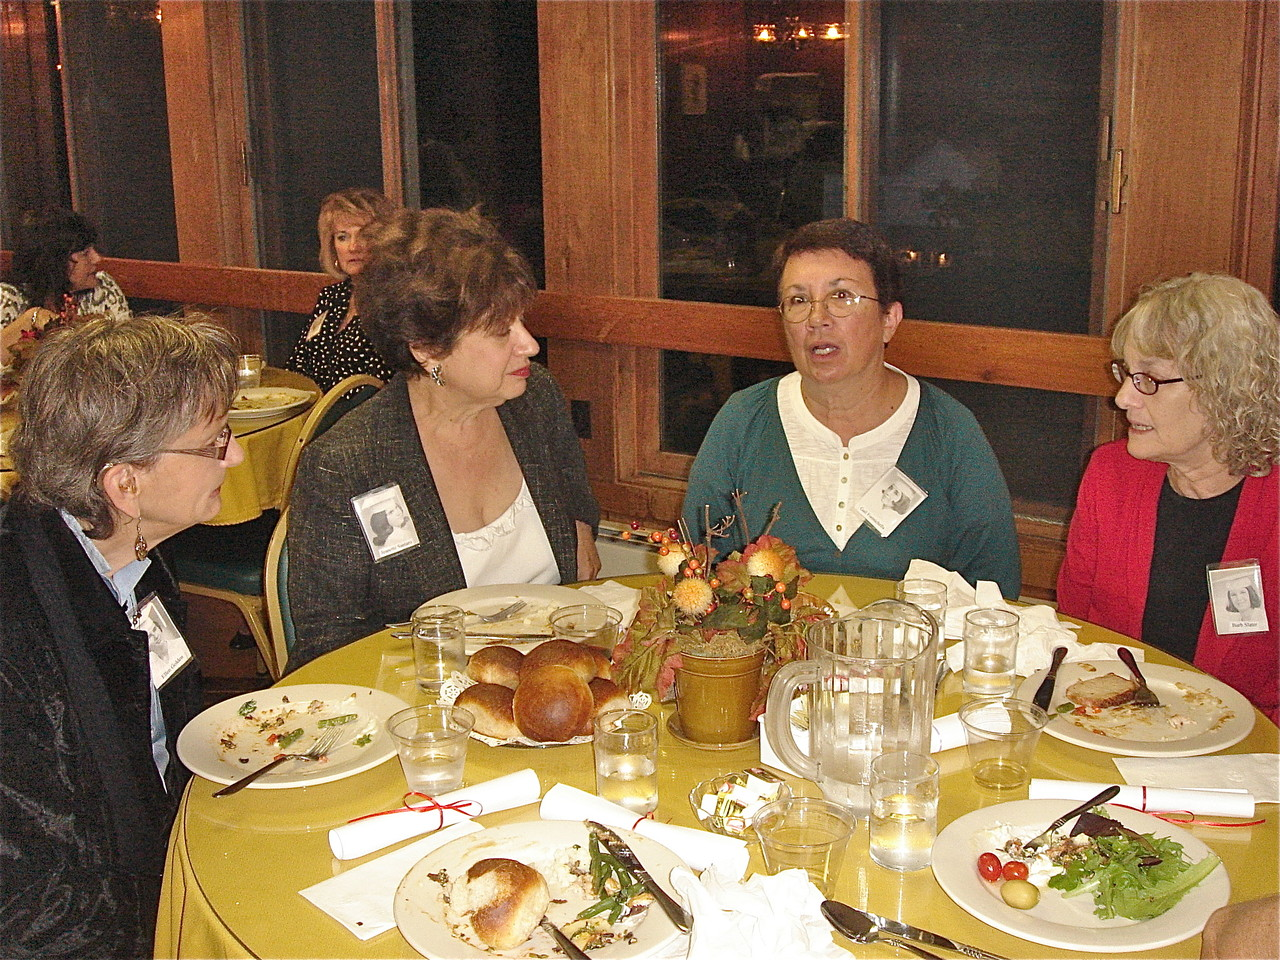 Ellen Golden, Jeanette Santaro, Gail Formichella, & Barbara Slater